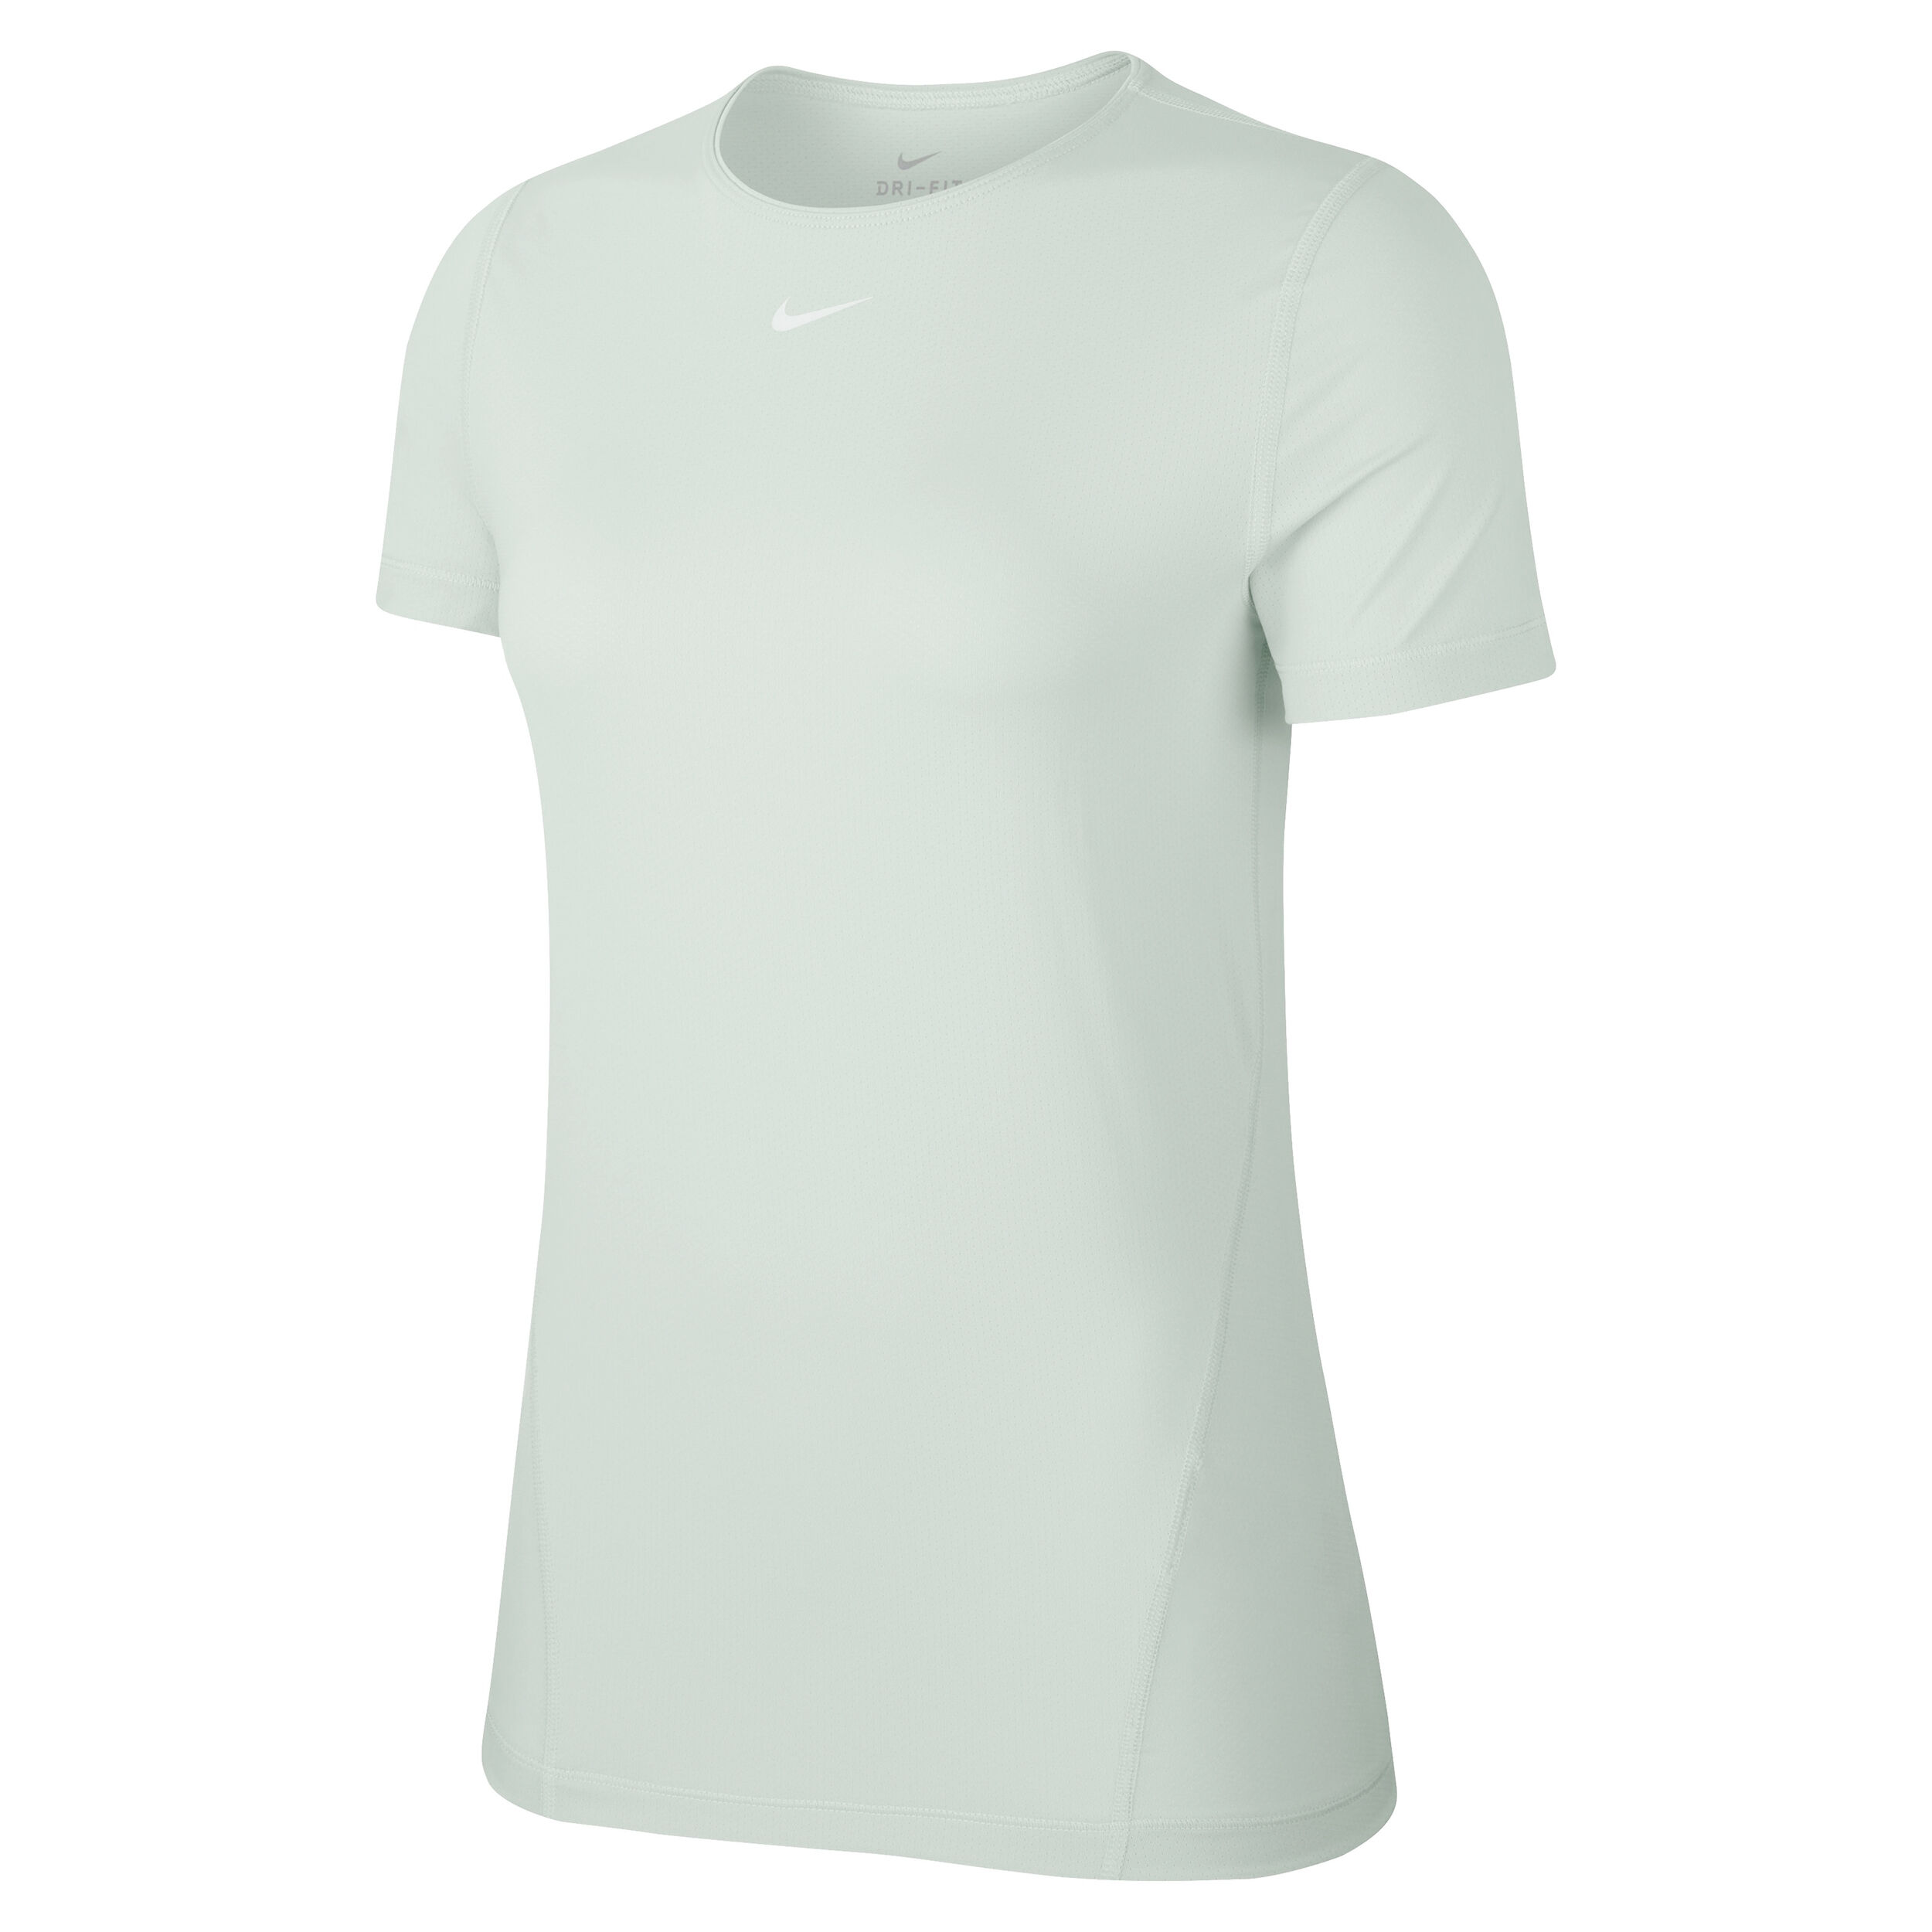 Pro T shirt Femmes Mint, Blanc